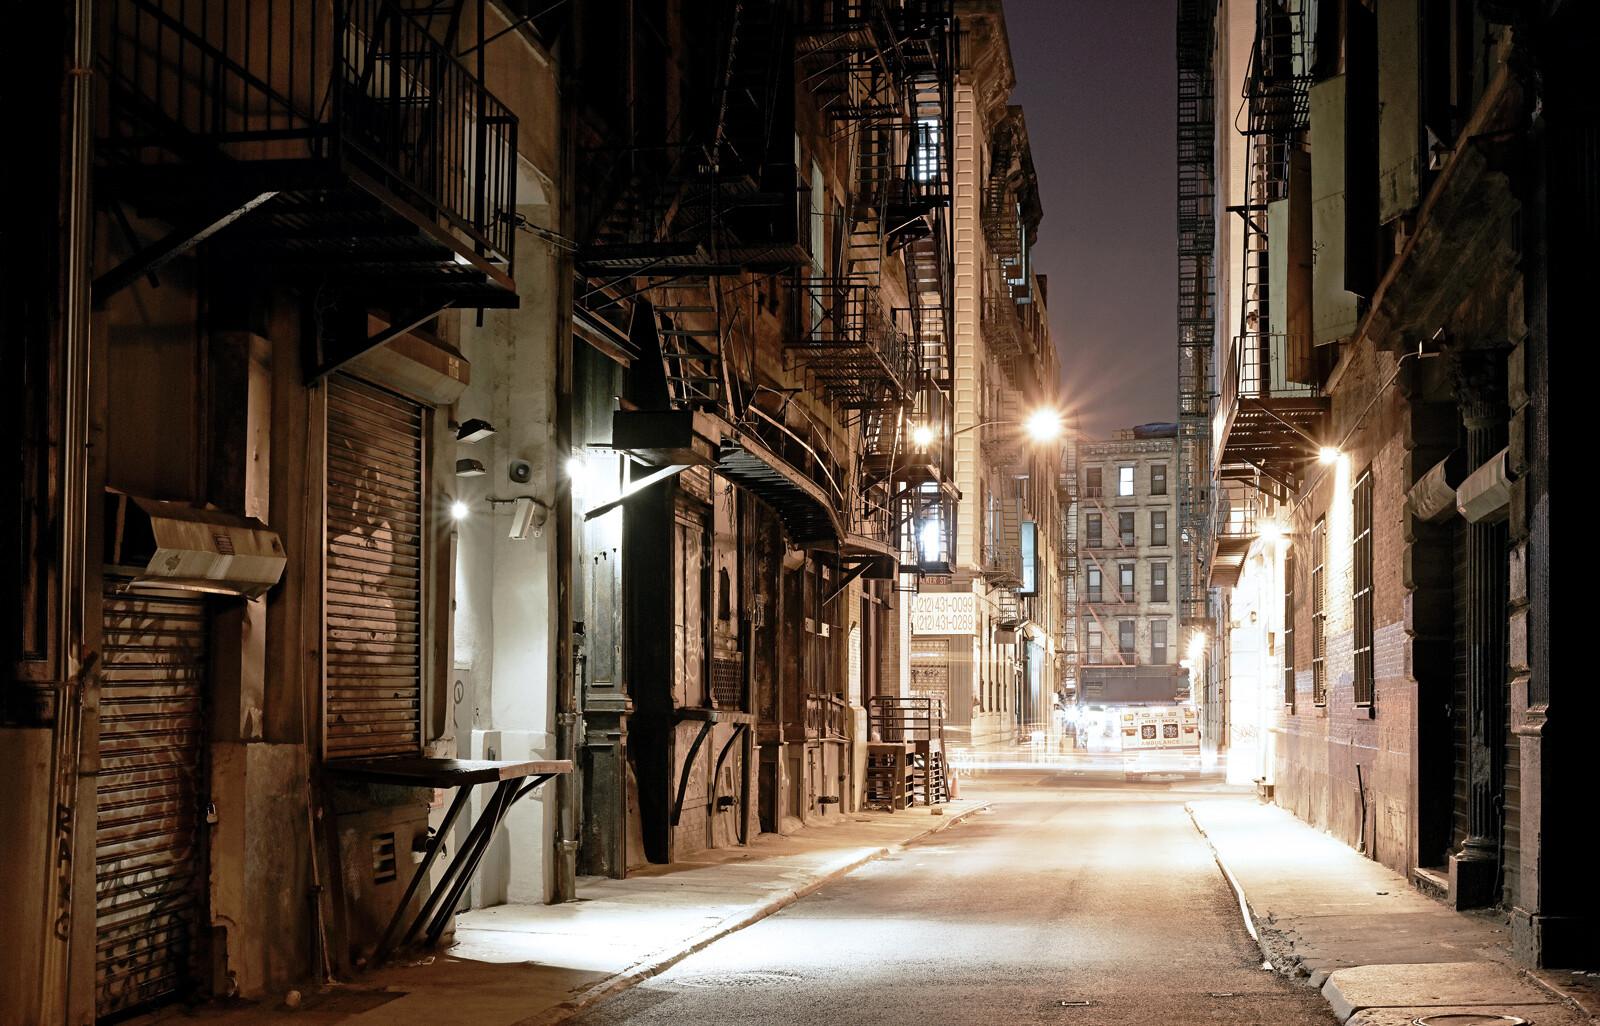 Cortlandt Alley - Horst & Daniel  Zielske